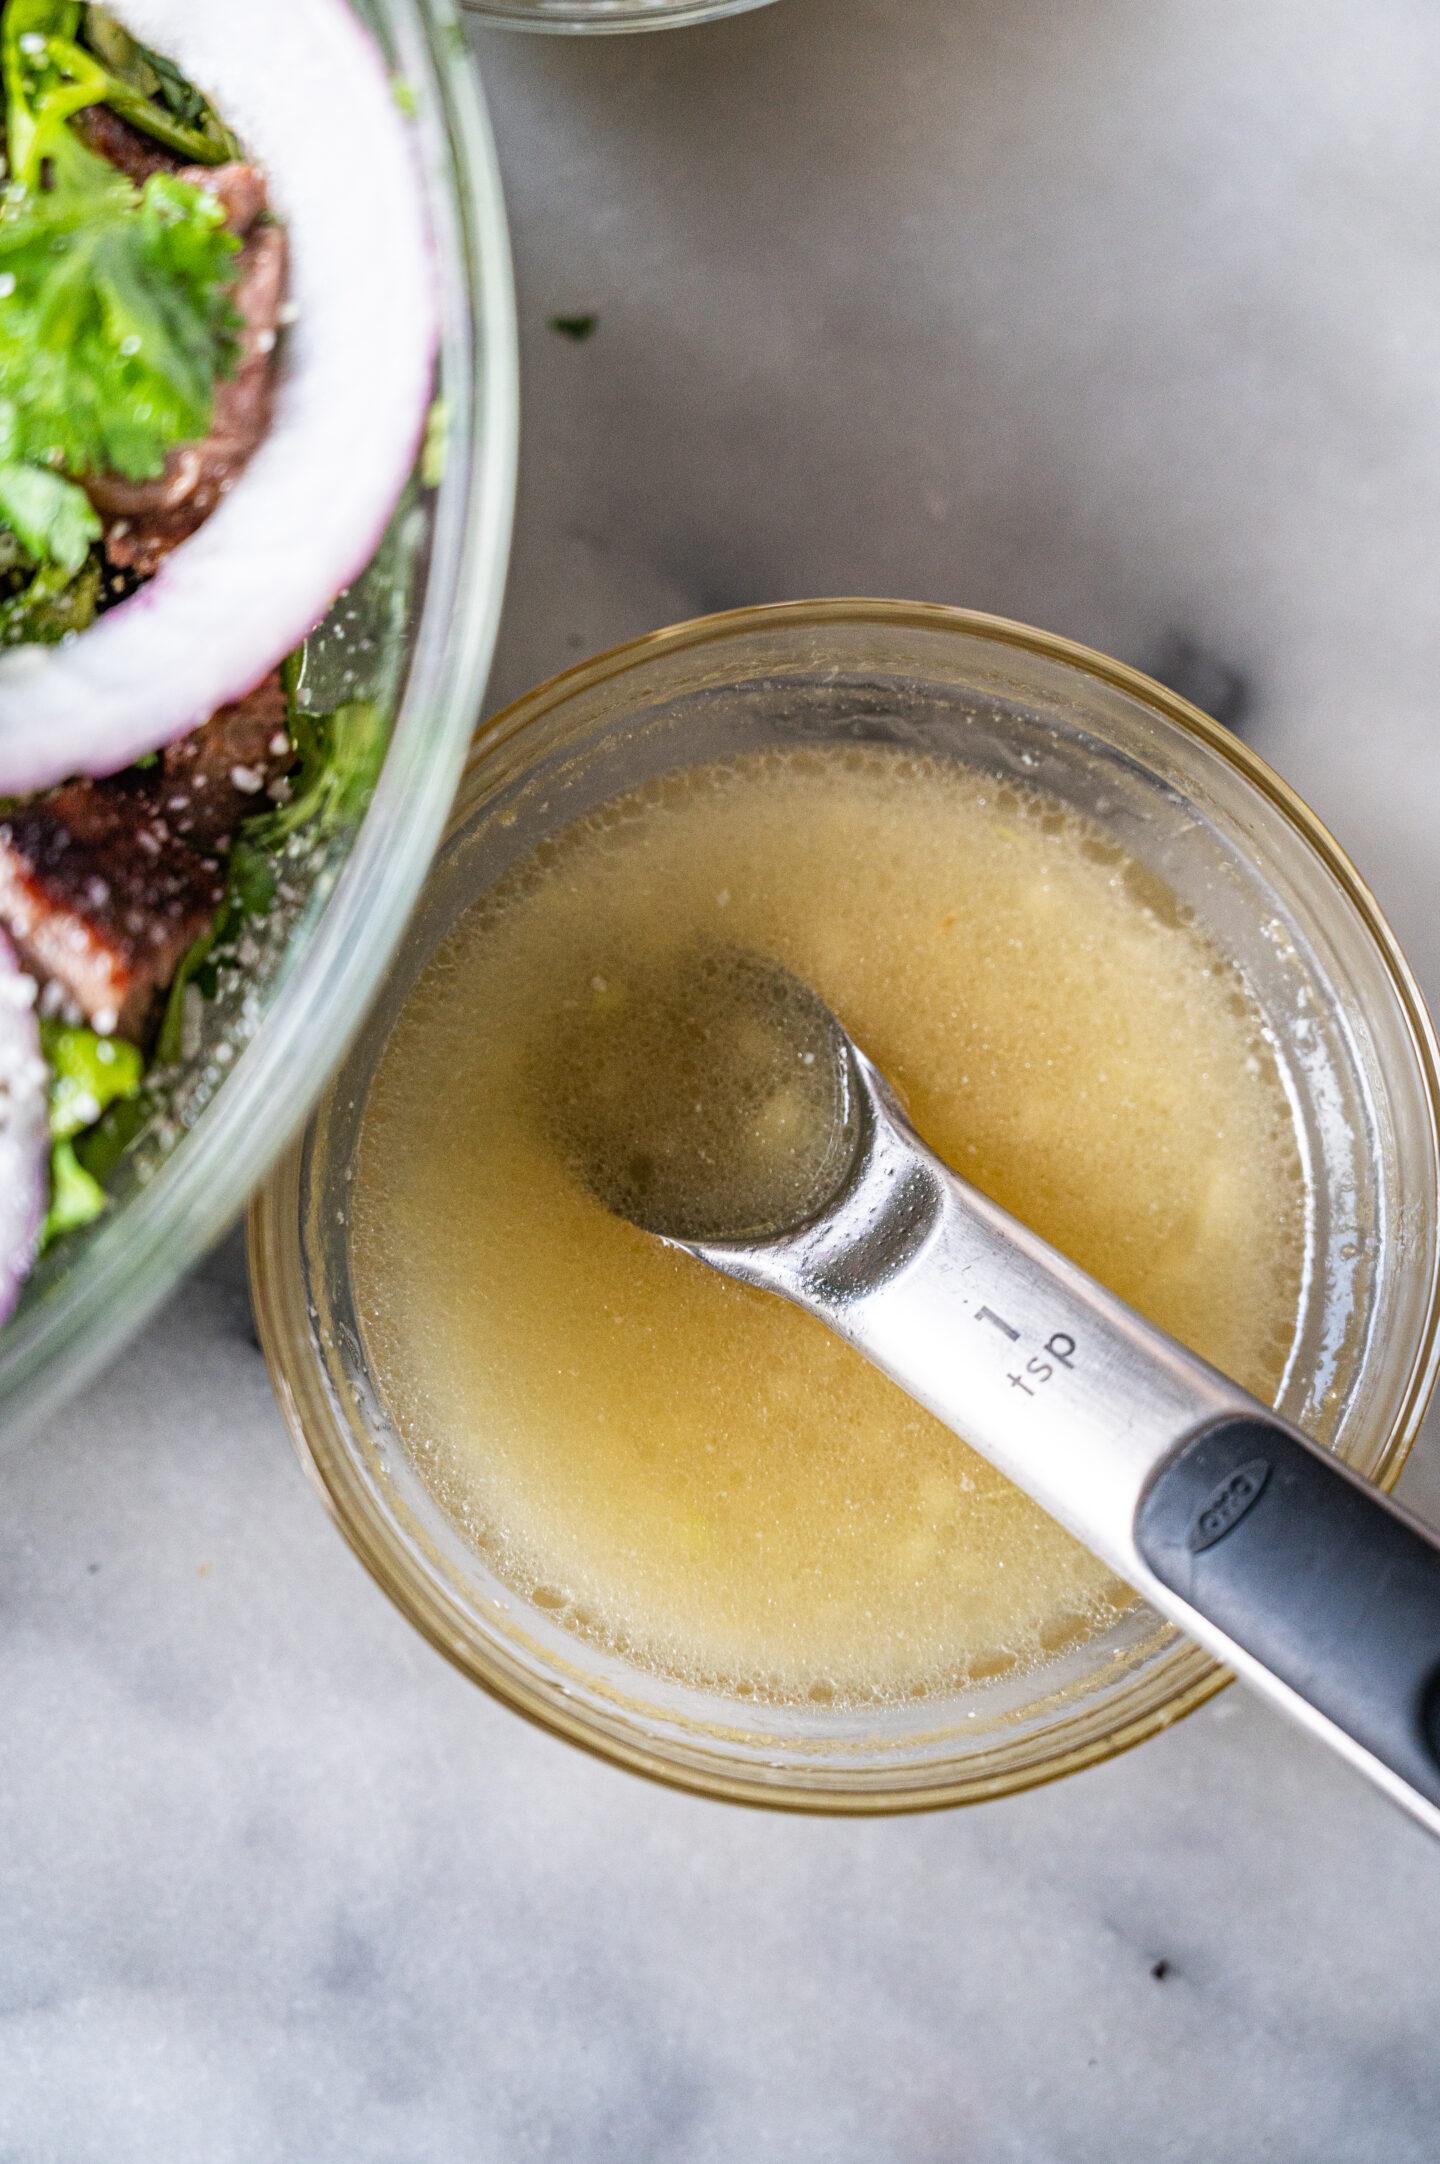 apple cider vinaigrette in a bowl next to a salad